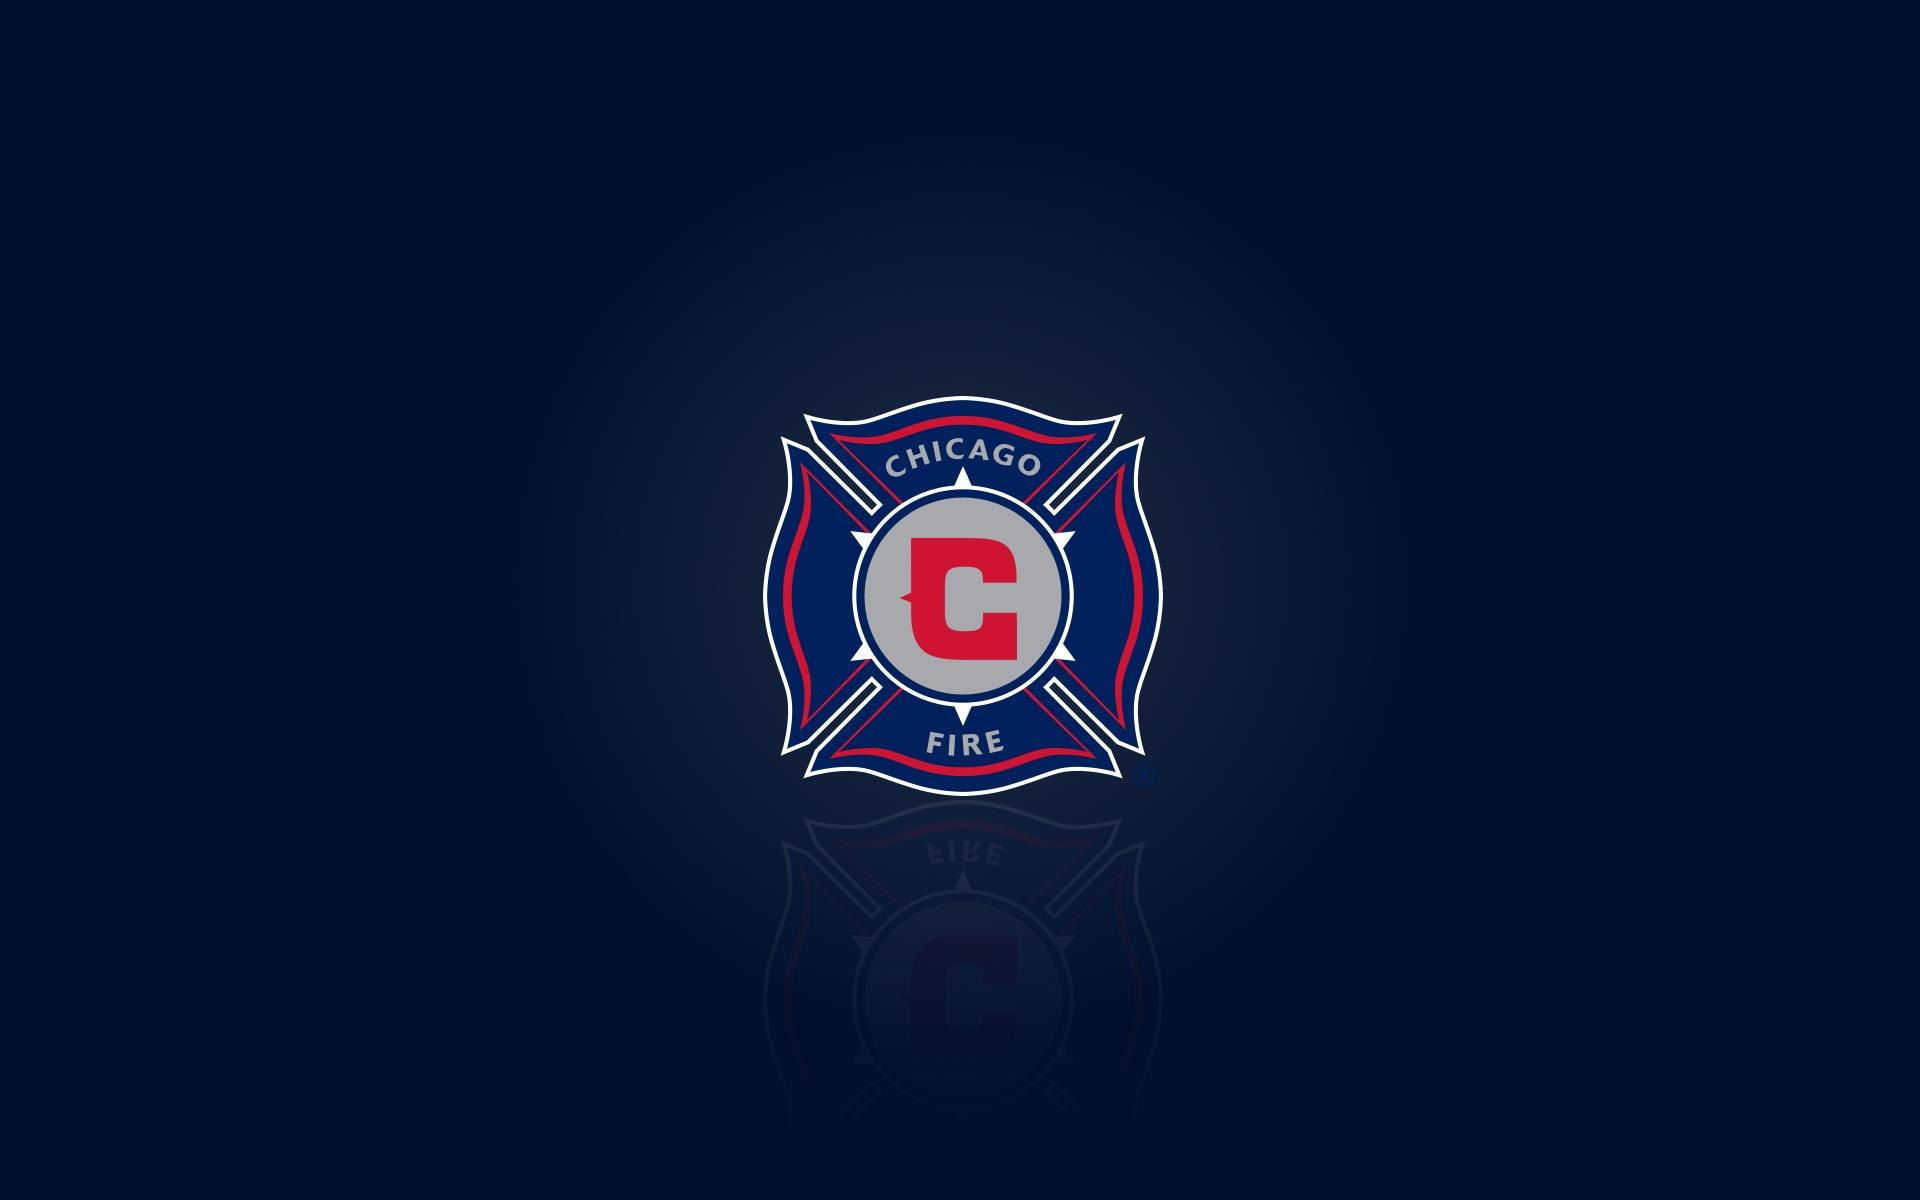 Chicago fire logos download chicago fire desktop wallpaper blue background 1920x1200 px biocorpaavc